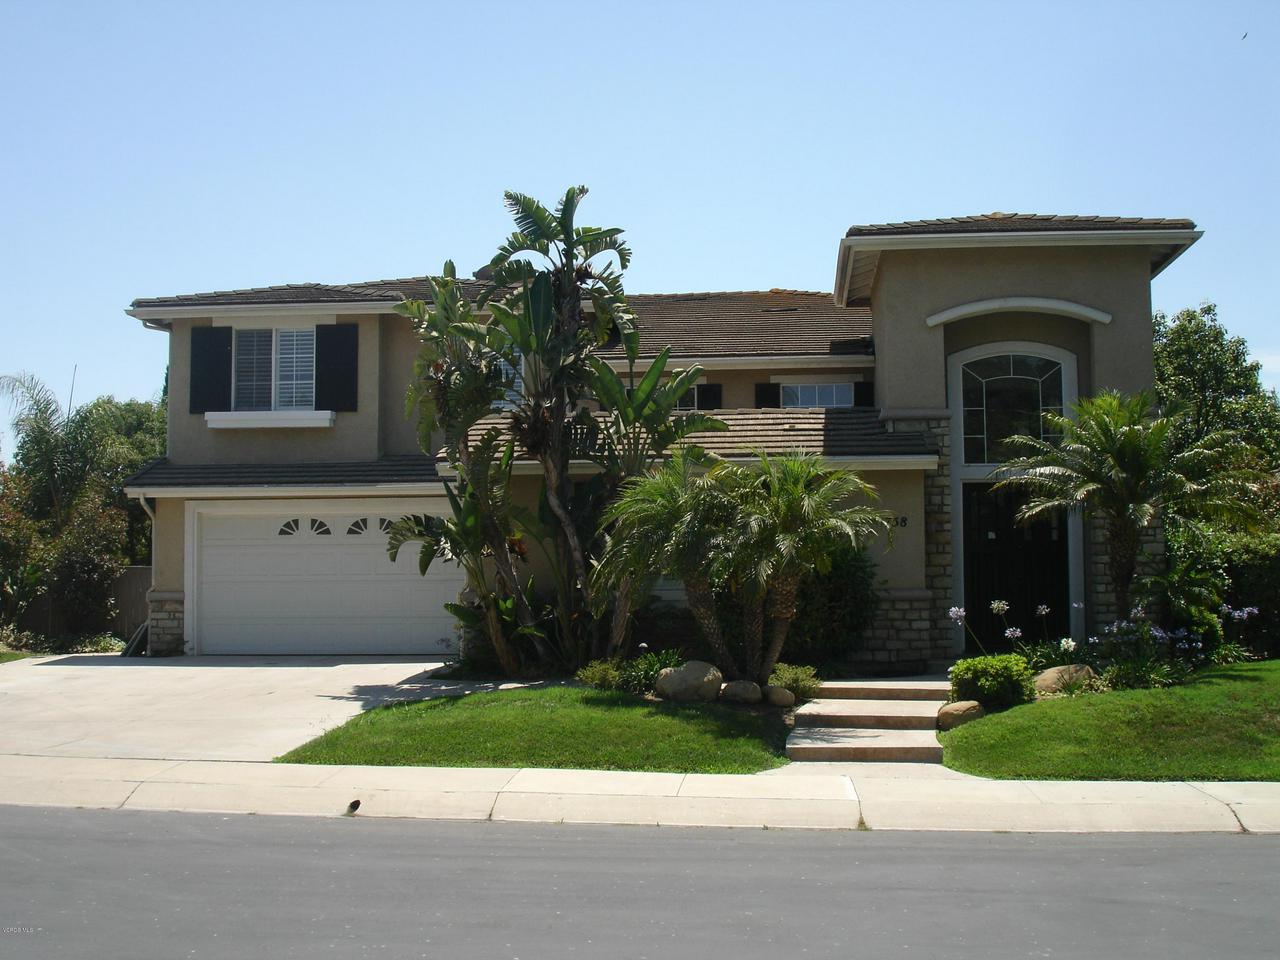 758 JEWEL, Camarillo, CA 93010 - DSC09824